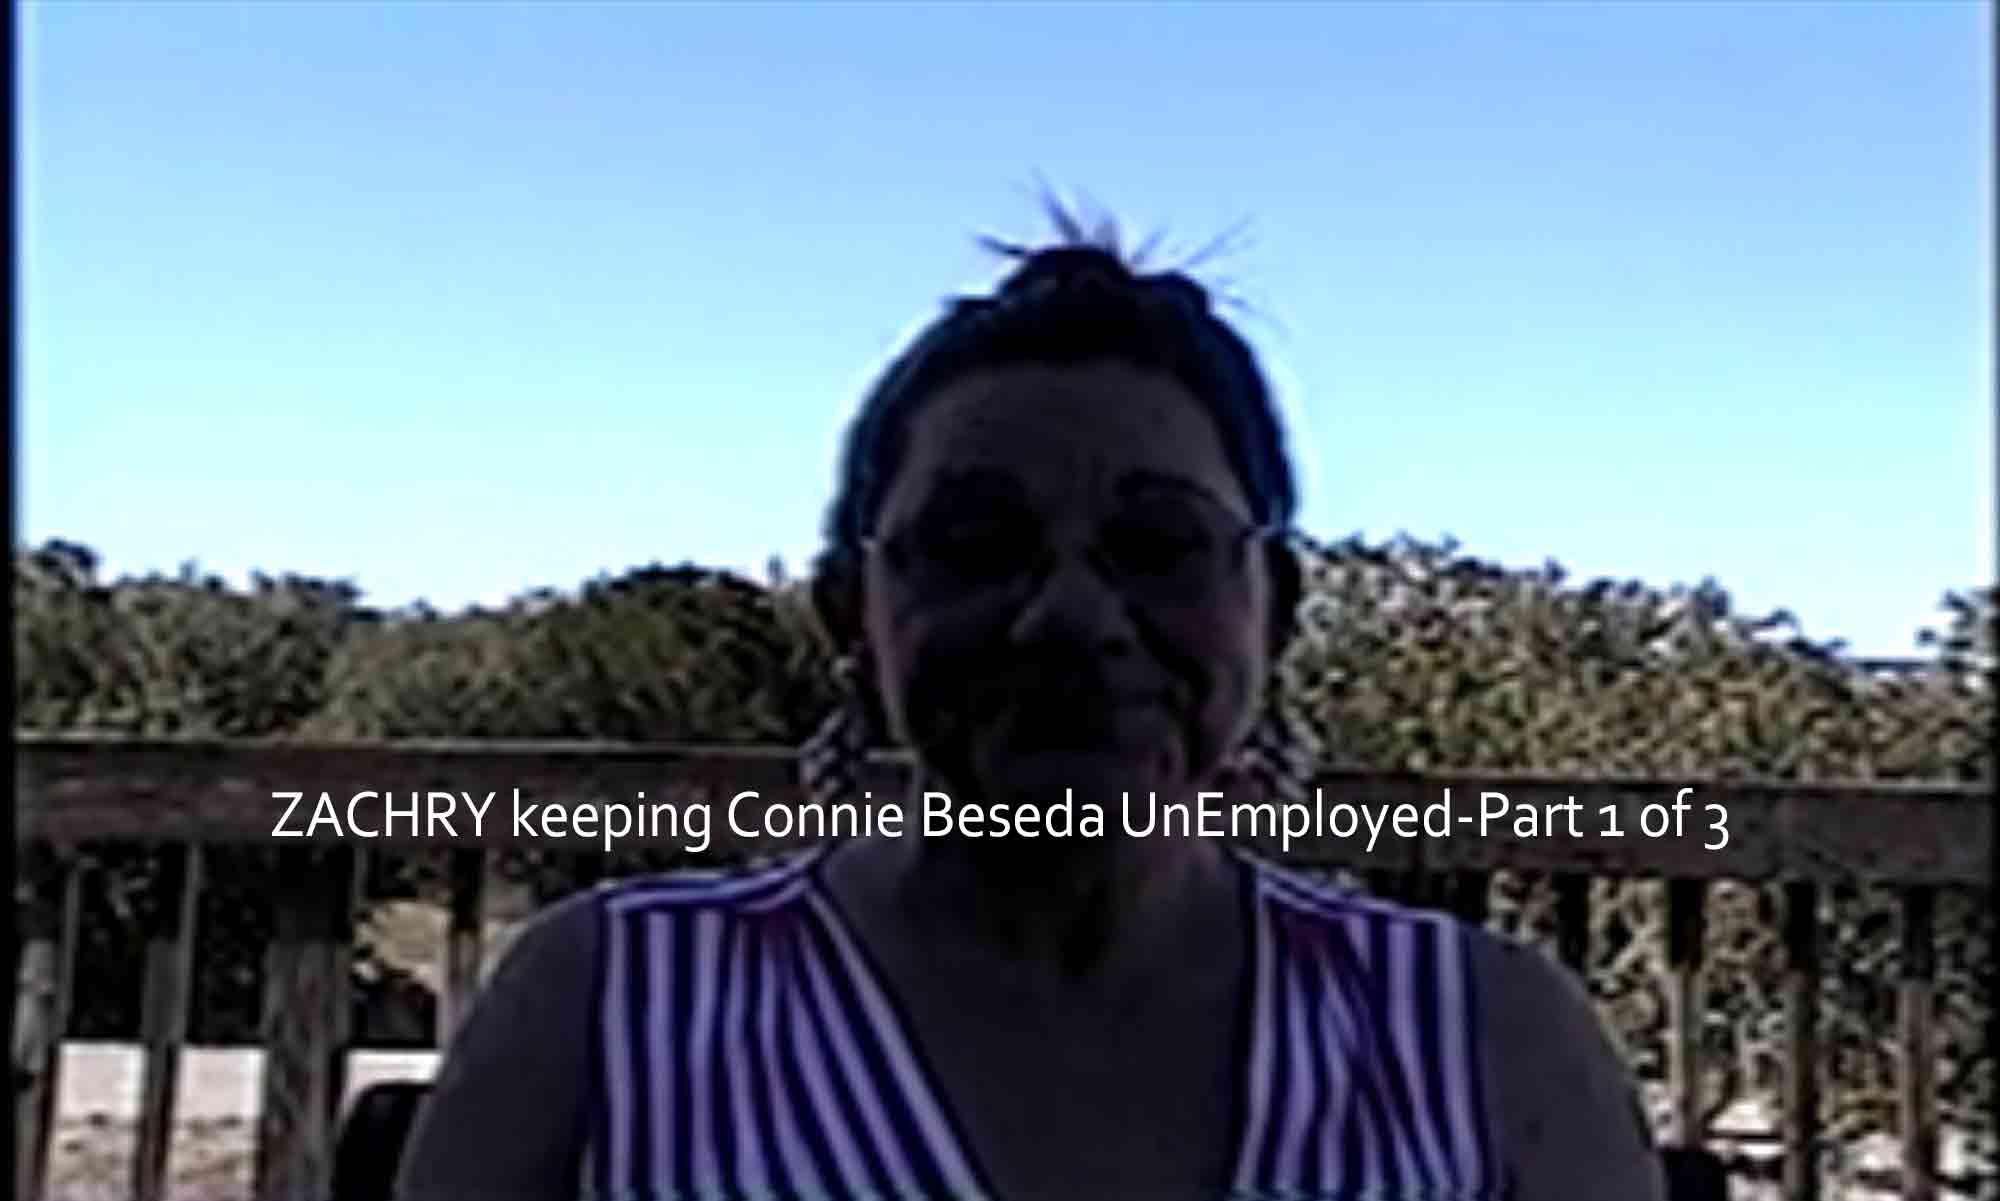 Image of ZACHRY keeping Connie Beseda UnEmployed Part 1 of 3 Brayton Scott Entertainment©